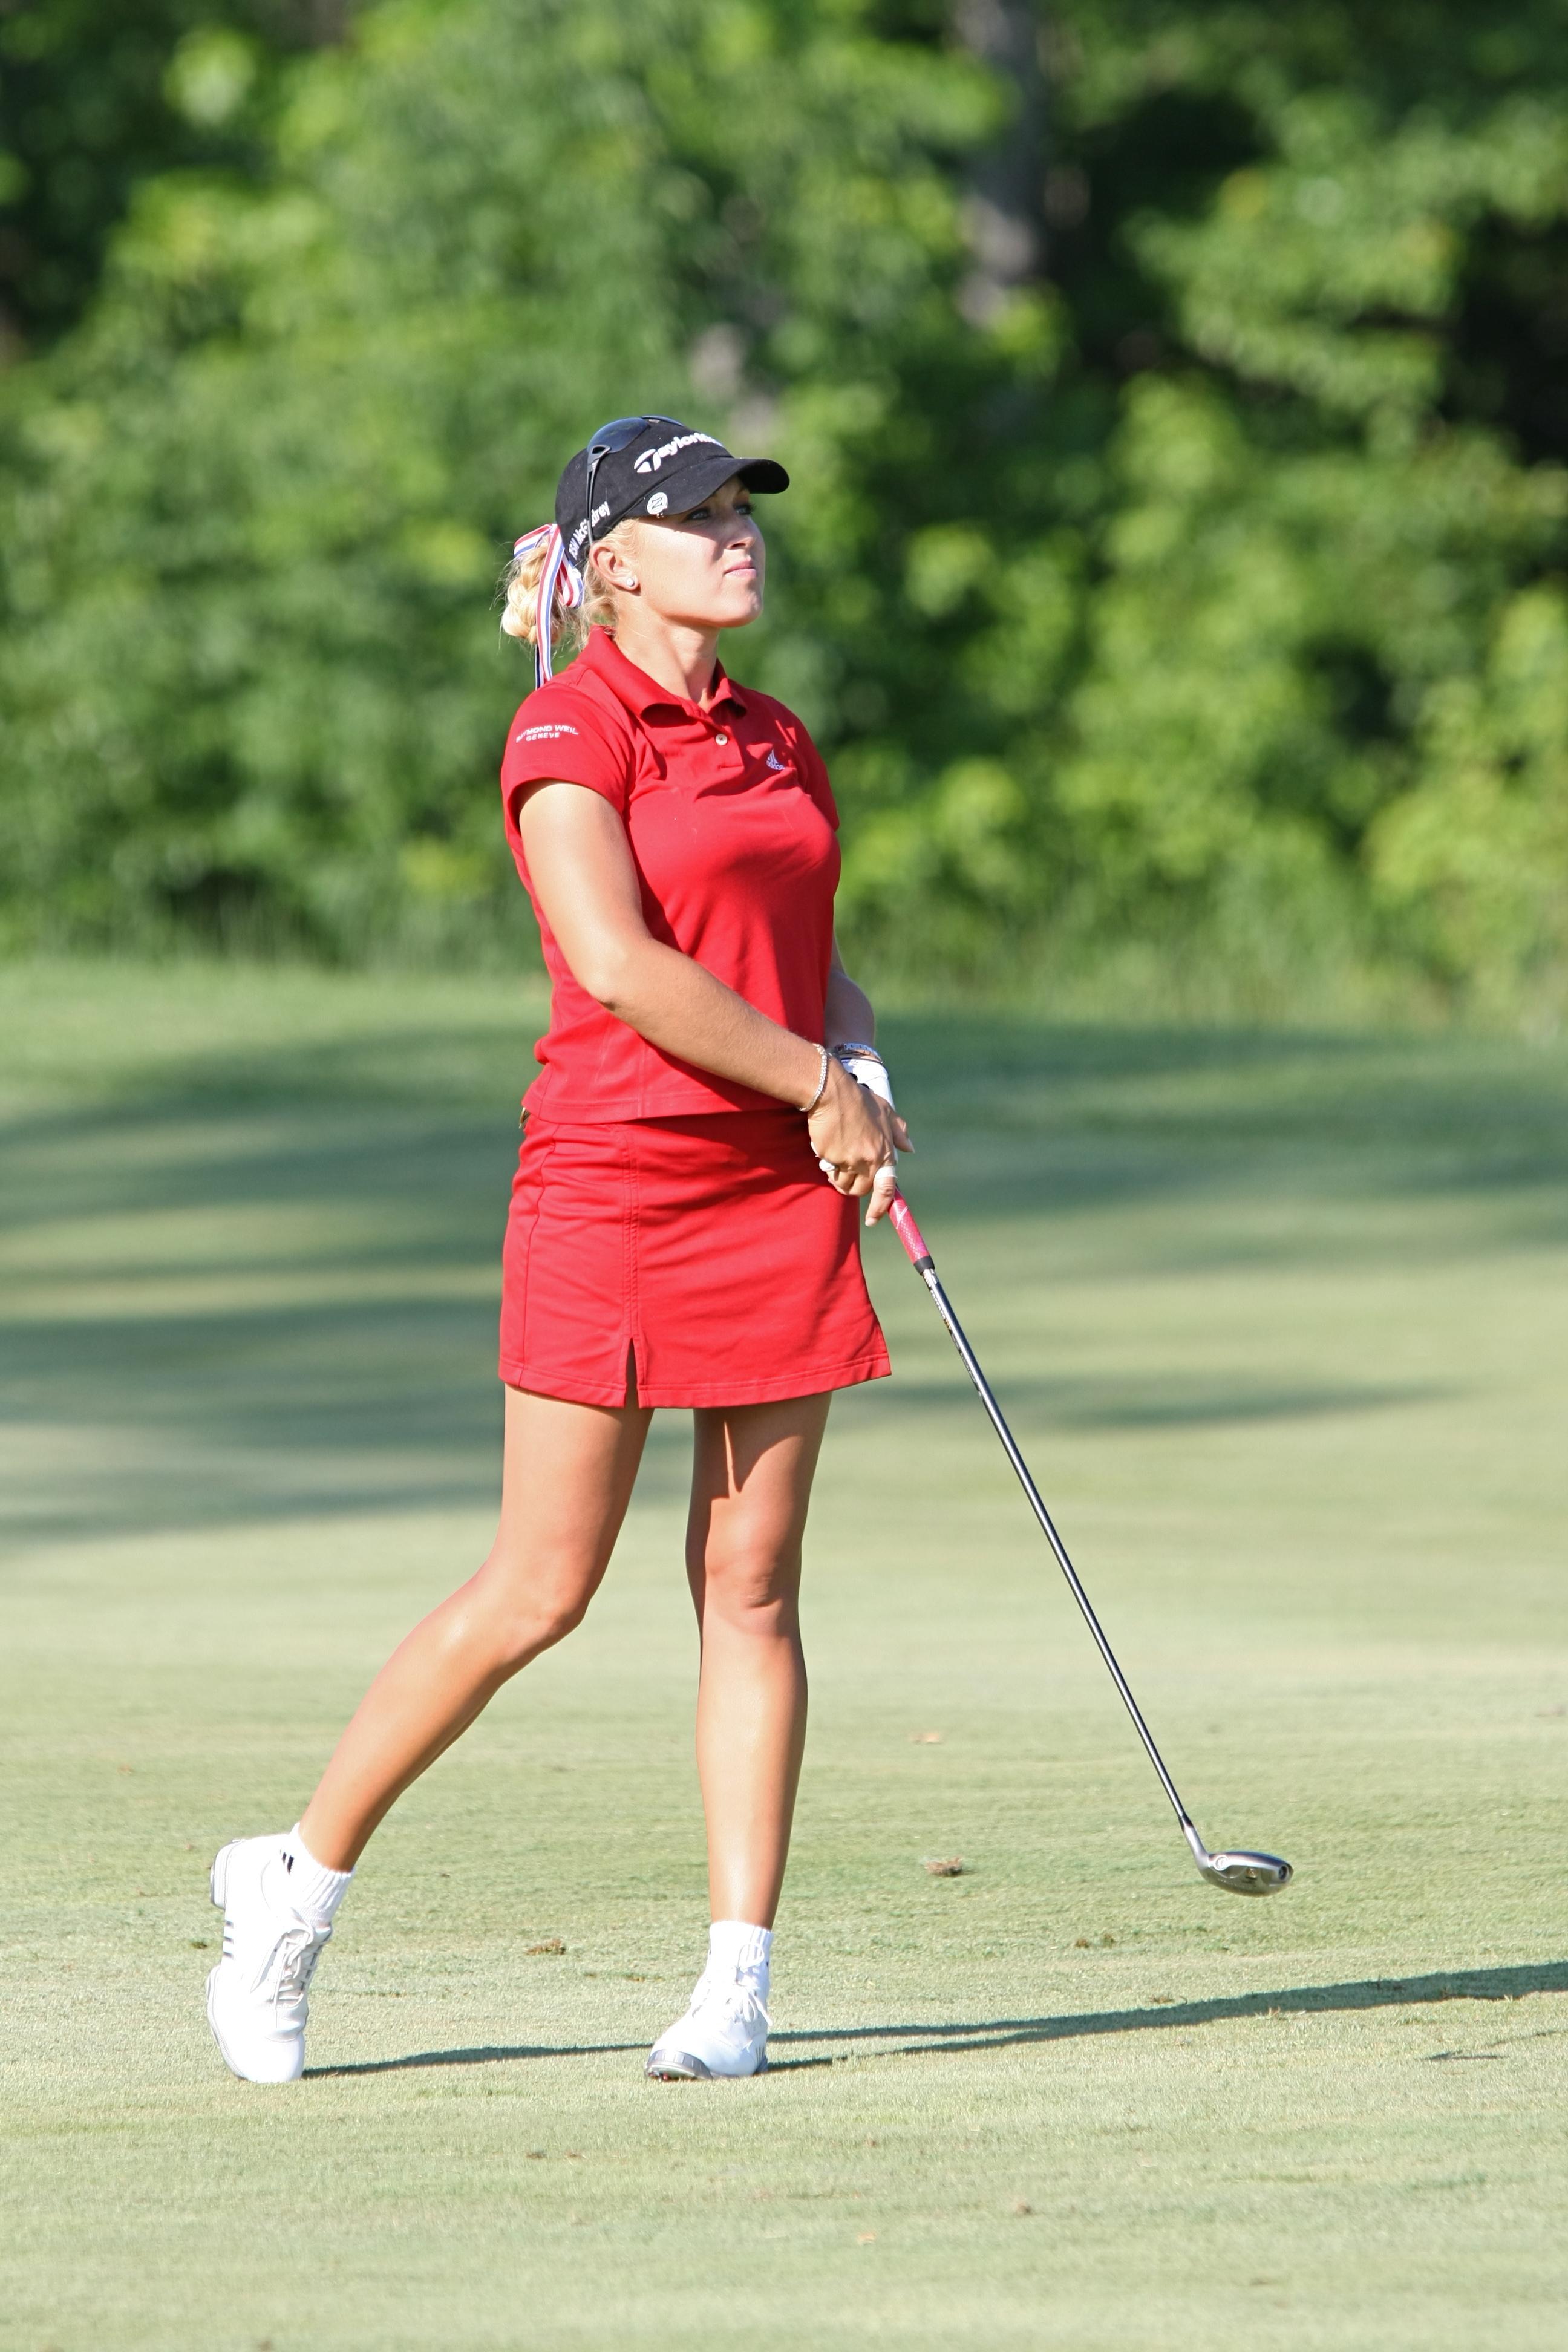 Kang takes 1-stroke lead in LPGA Tour event at Lake Merced